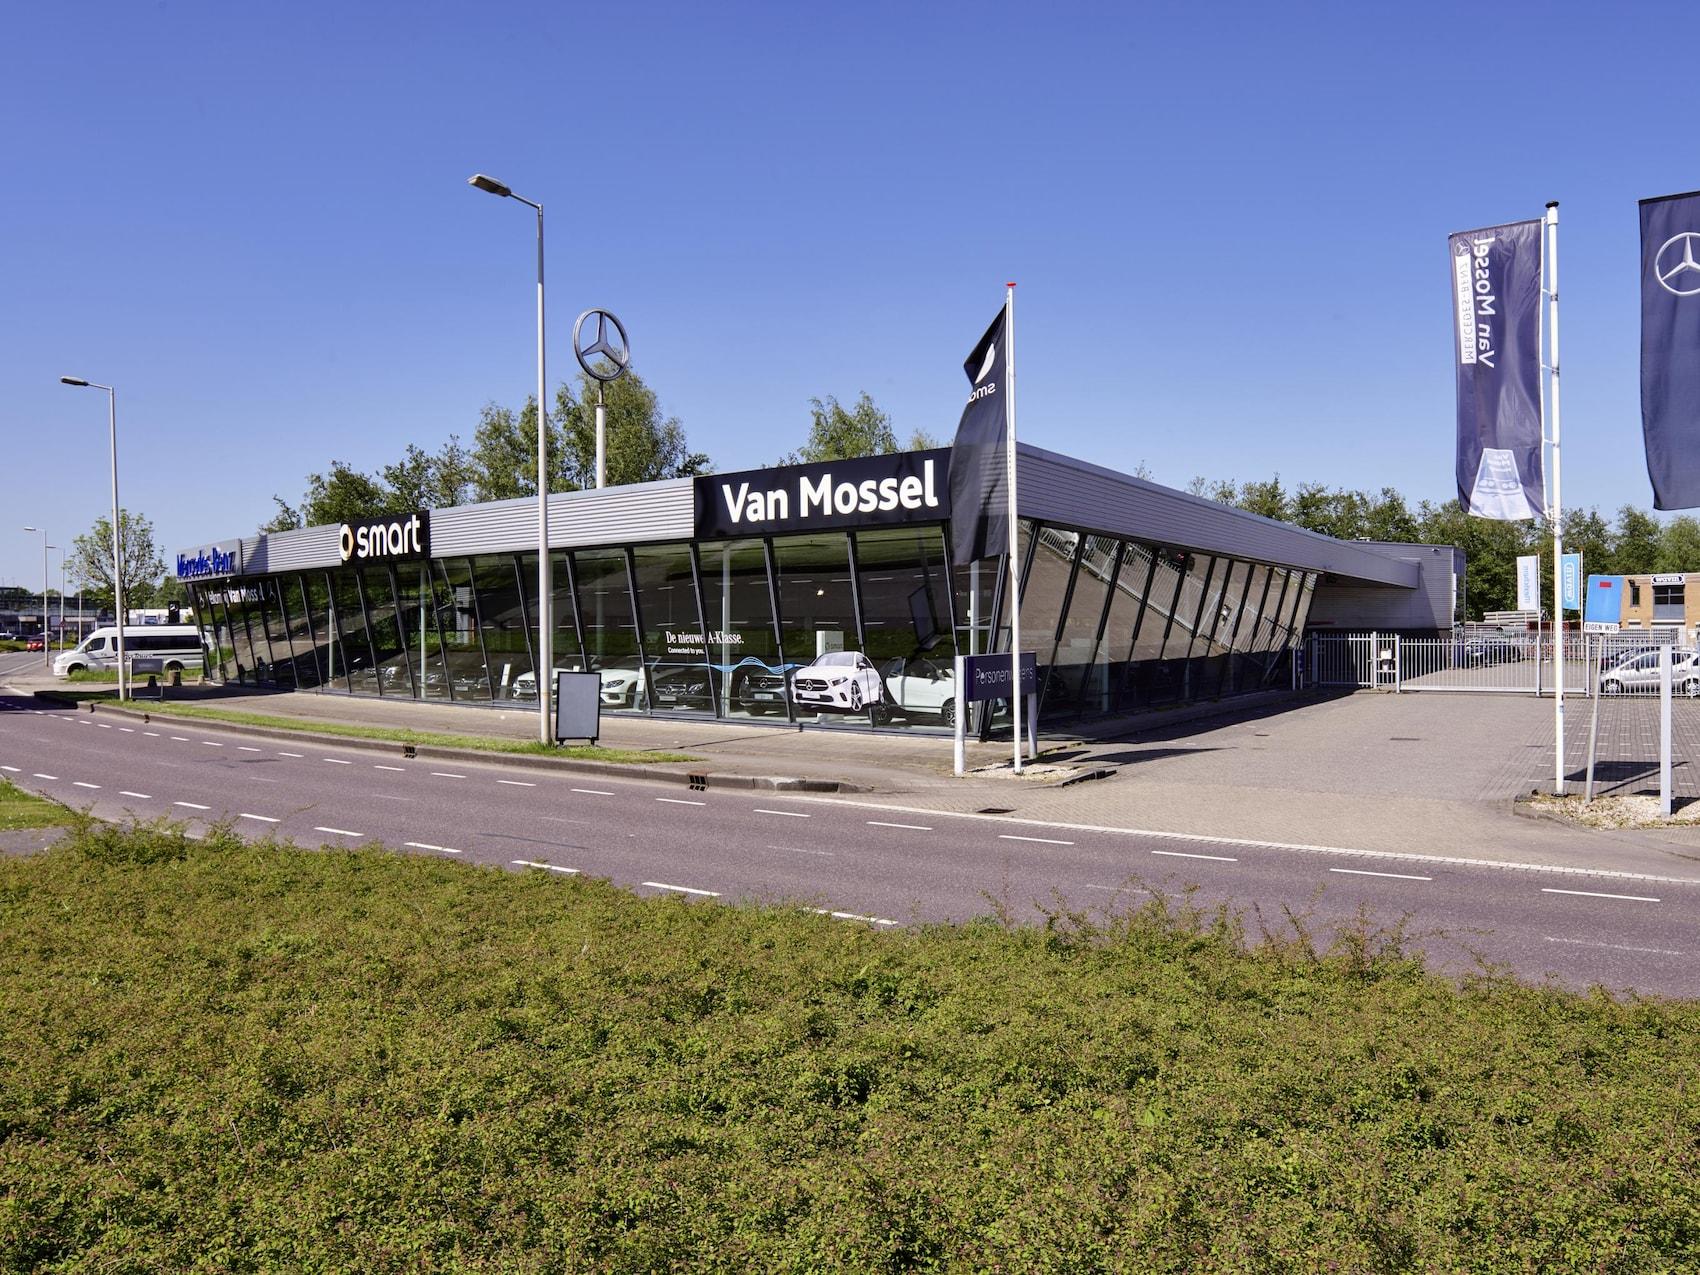 Vestiging_Van Mossel smart_Rotterdam Charlois